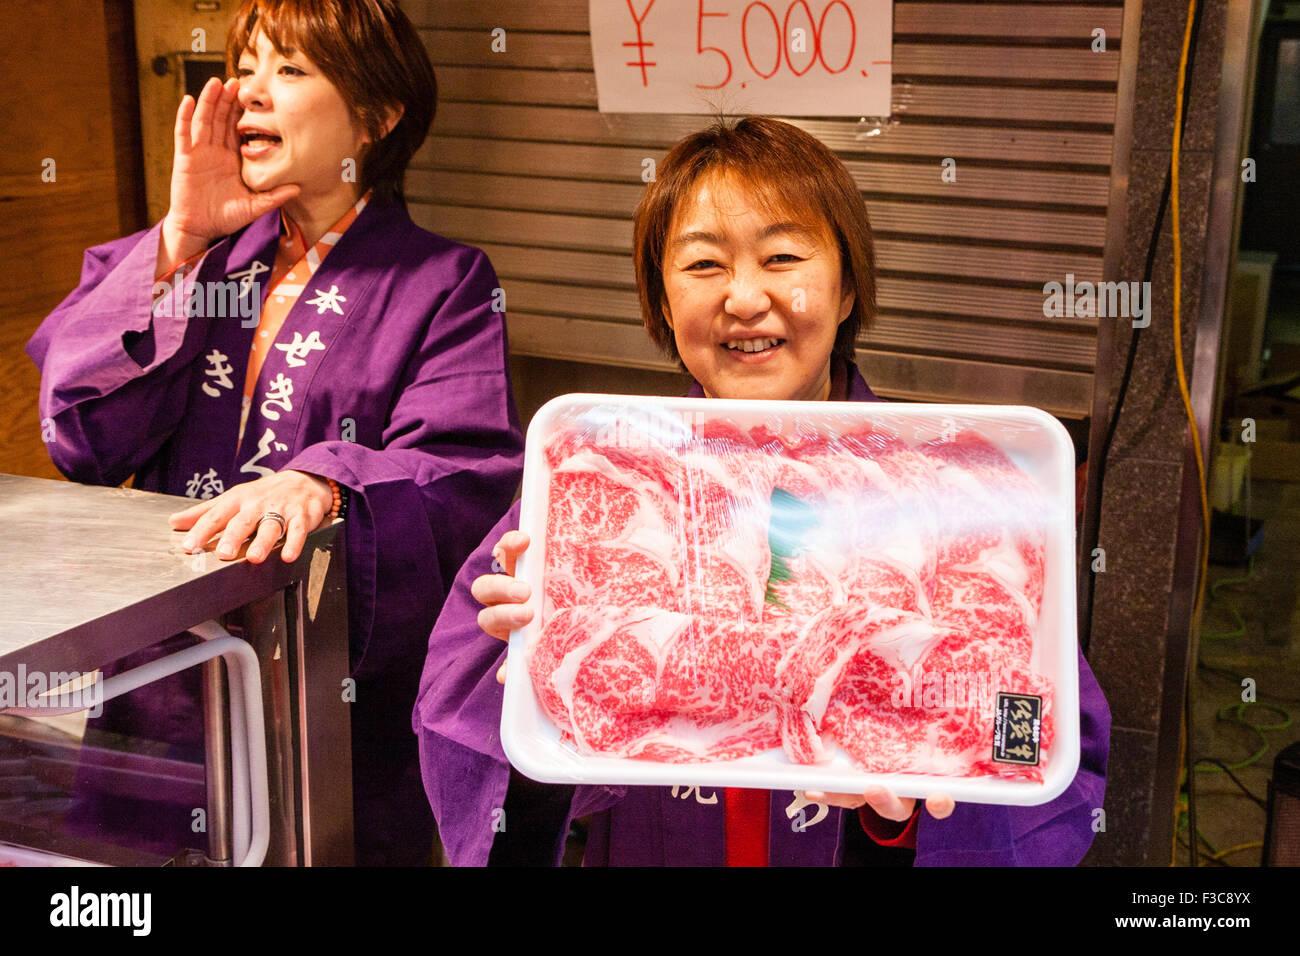 Japan, Osaka, Kuromon Ichiba Market, 'Osaka Kitchen', woman seller holding up container of Saga Beef, Sagagyu - Stock Image